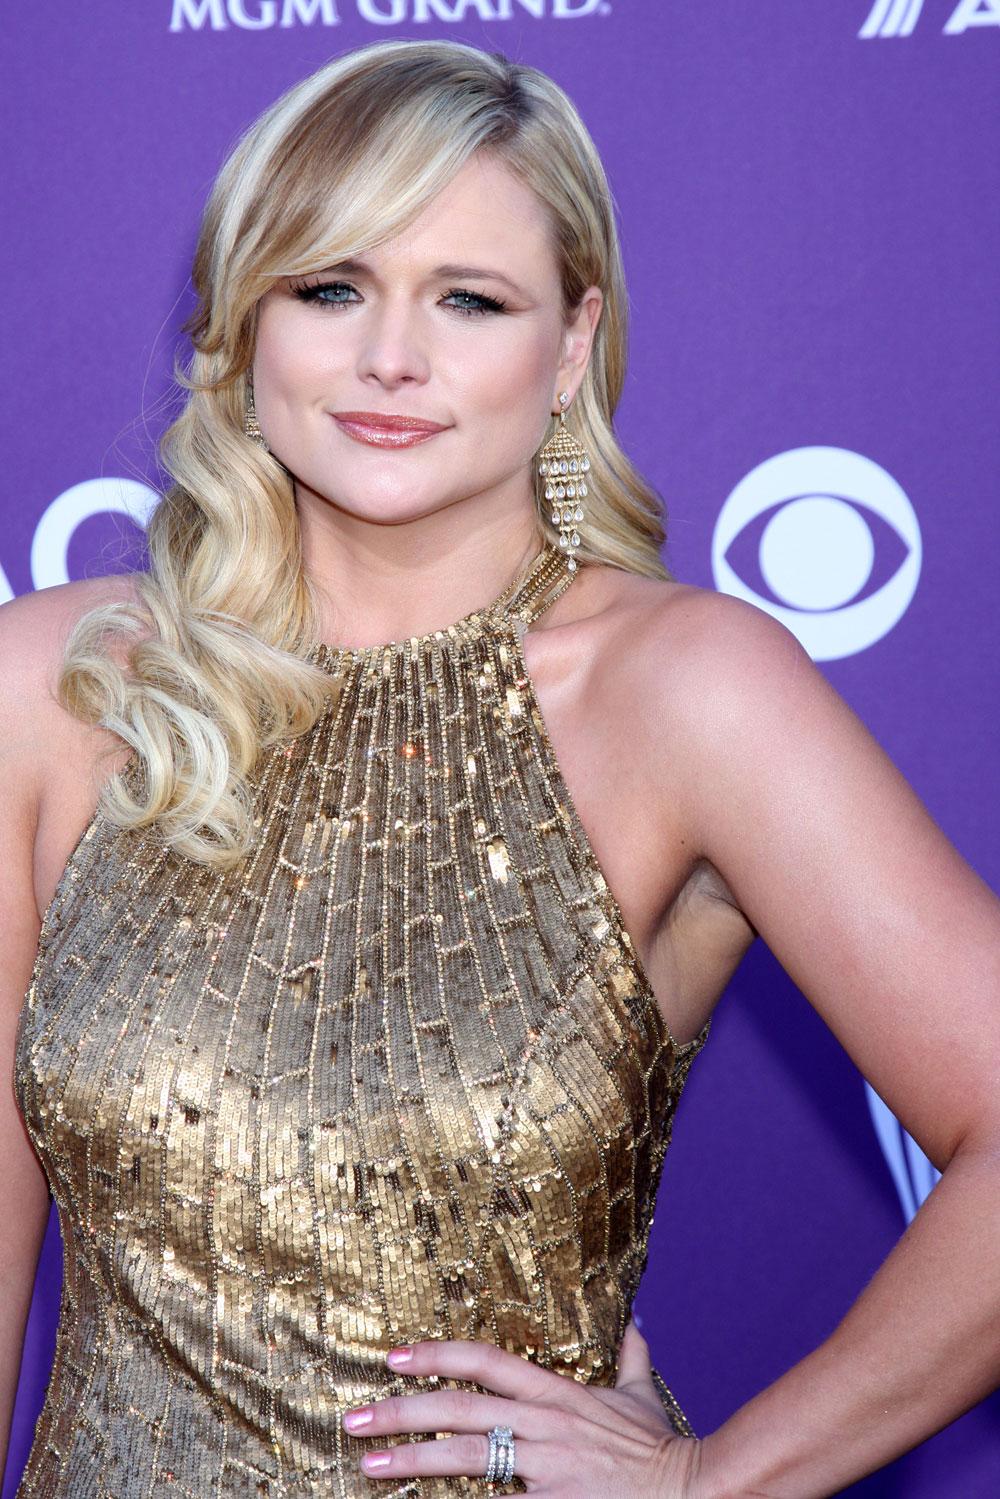 Have You Seen What Miranda Lambert Bought Carrie Underwood?